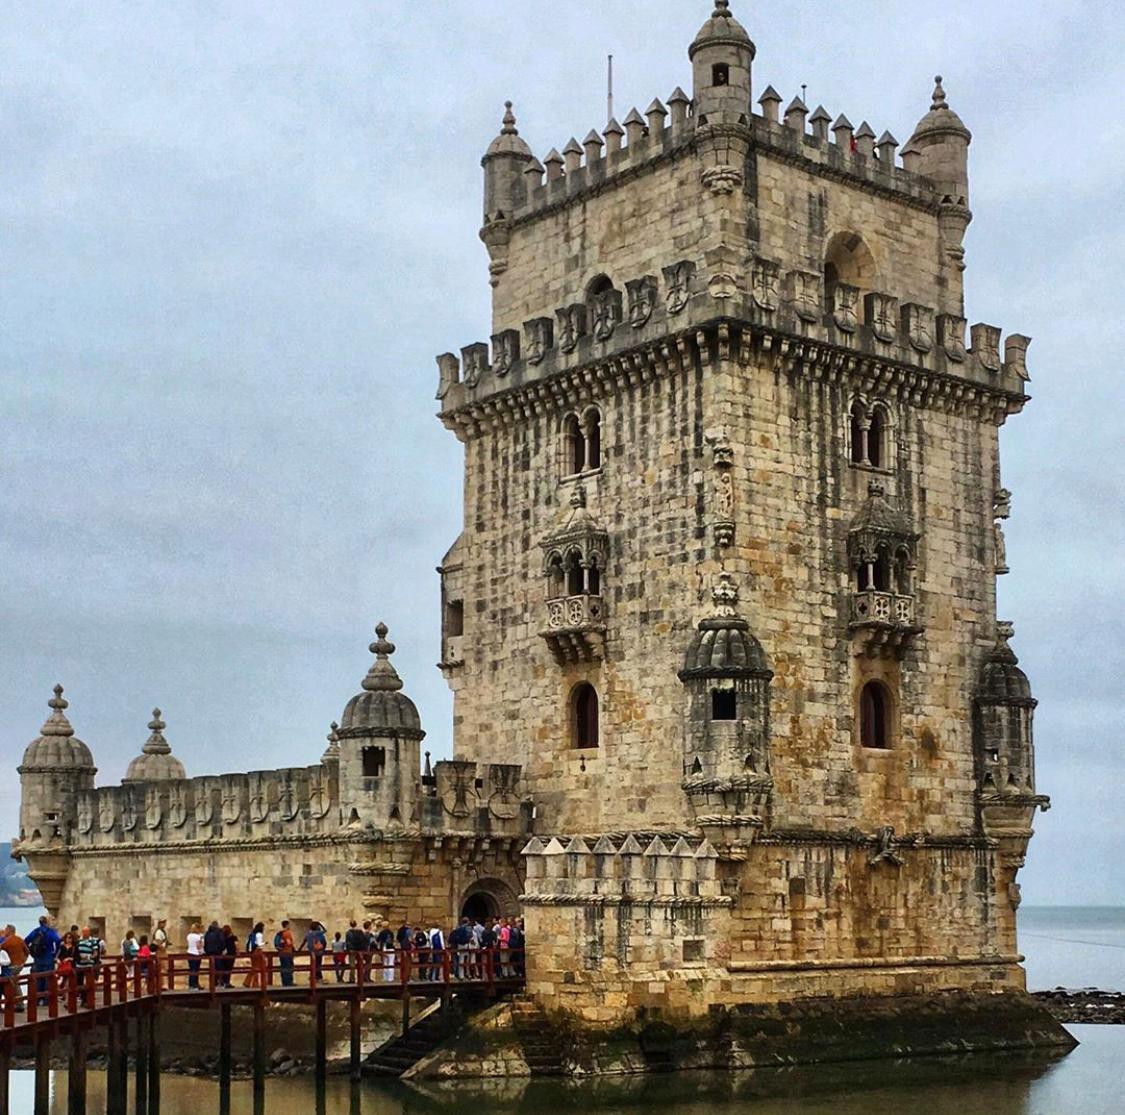 The Belem Tower - Top 13 Instagram Spots In Lisbon